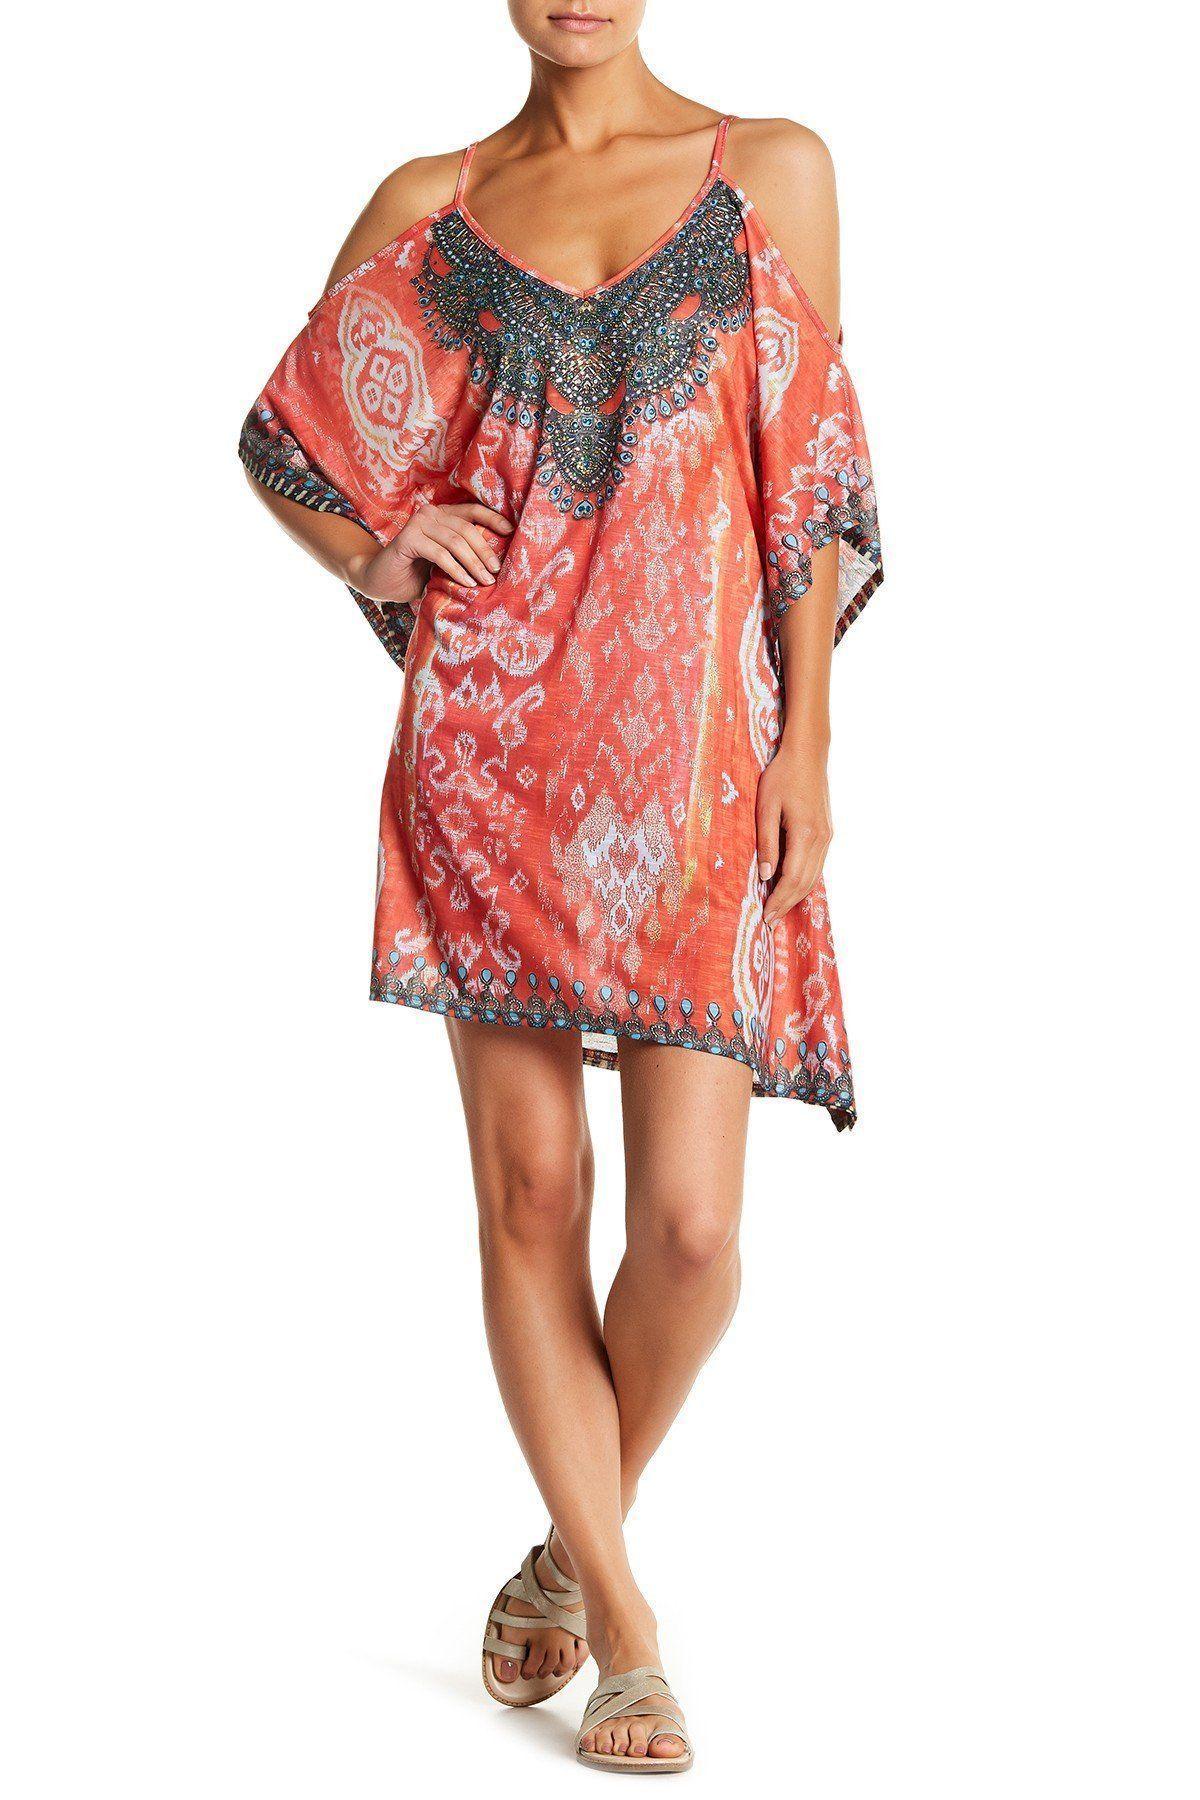 La Moda Womens Beach Dresses Womens Resort Wear & Vacation Clothing | beach outfits women vacation